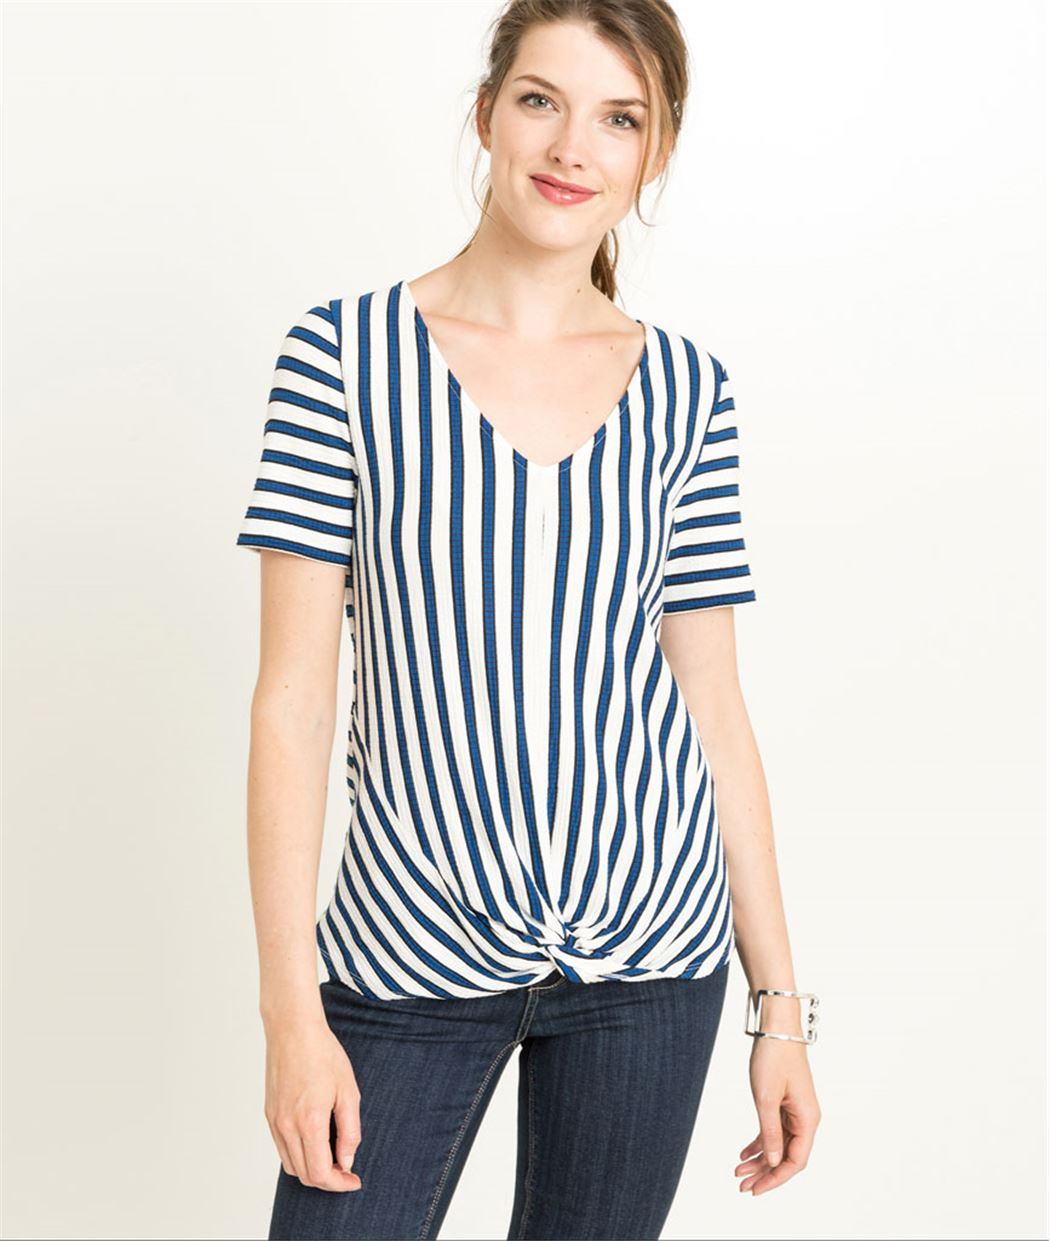 T-shirt femme rayé manches courtes noeud BLANC